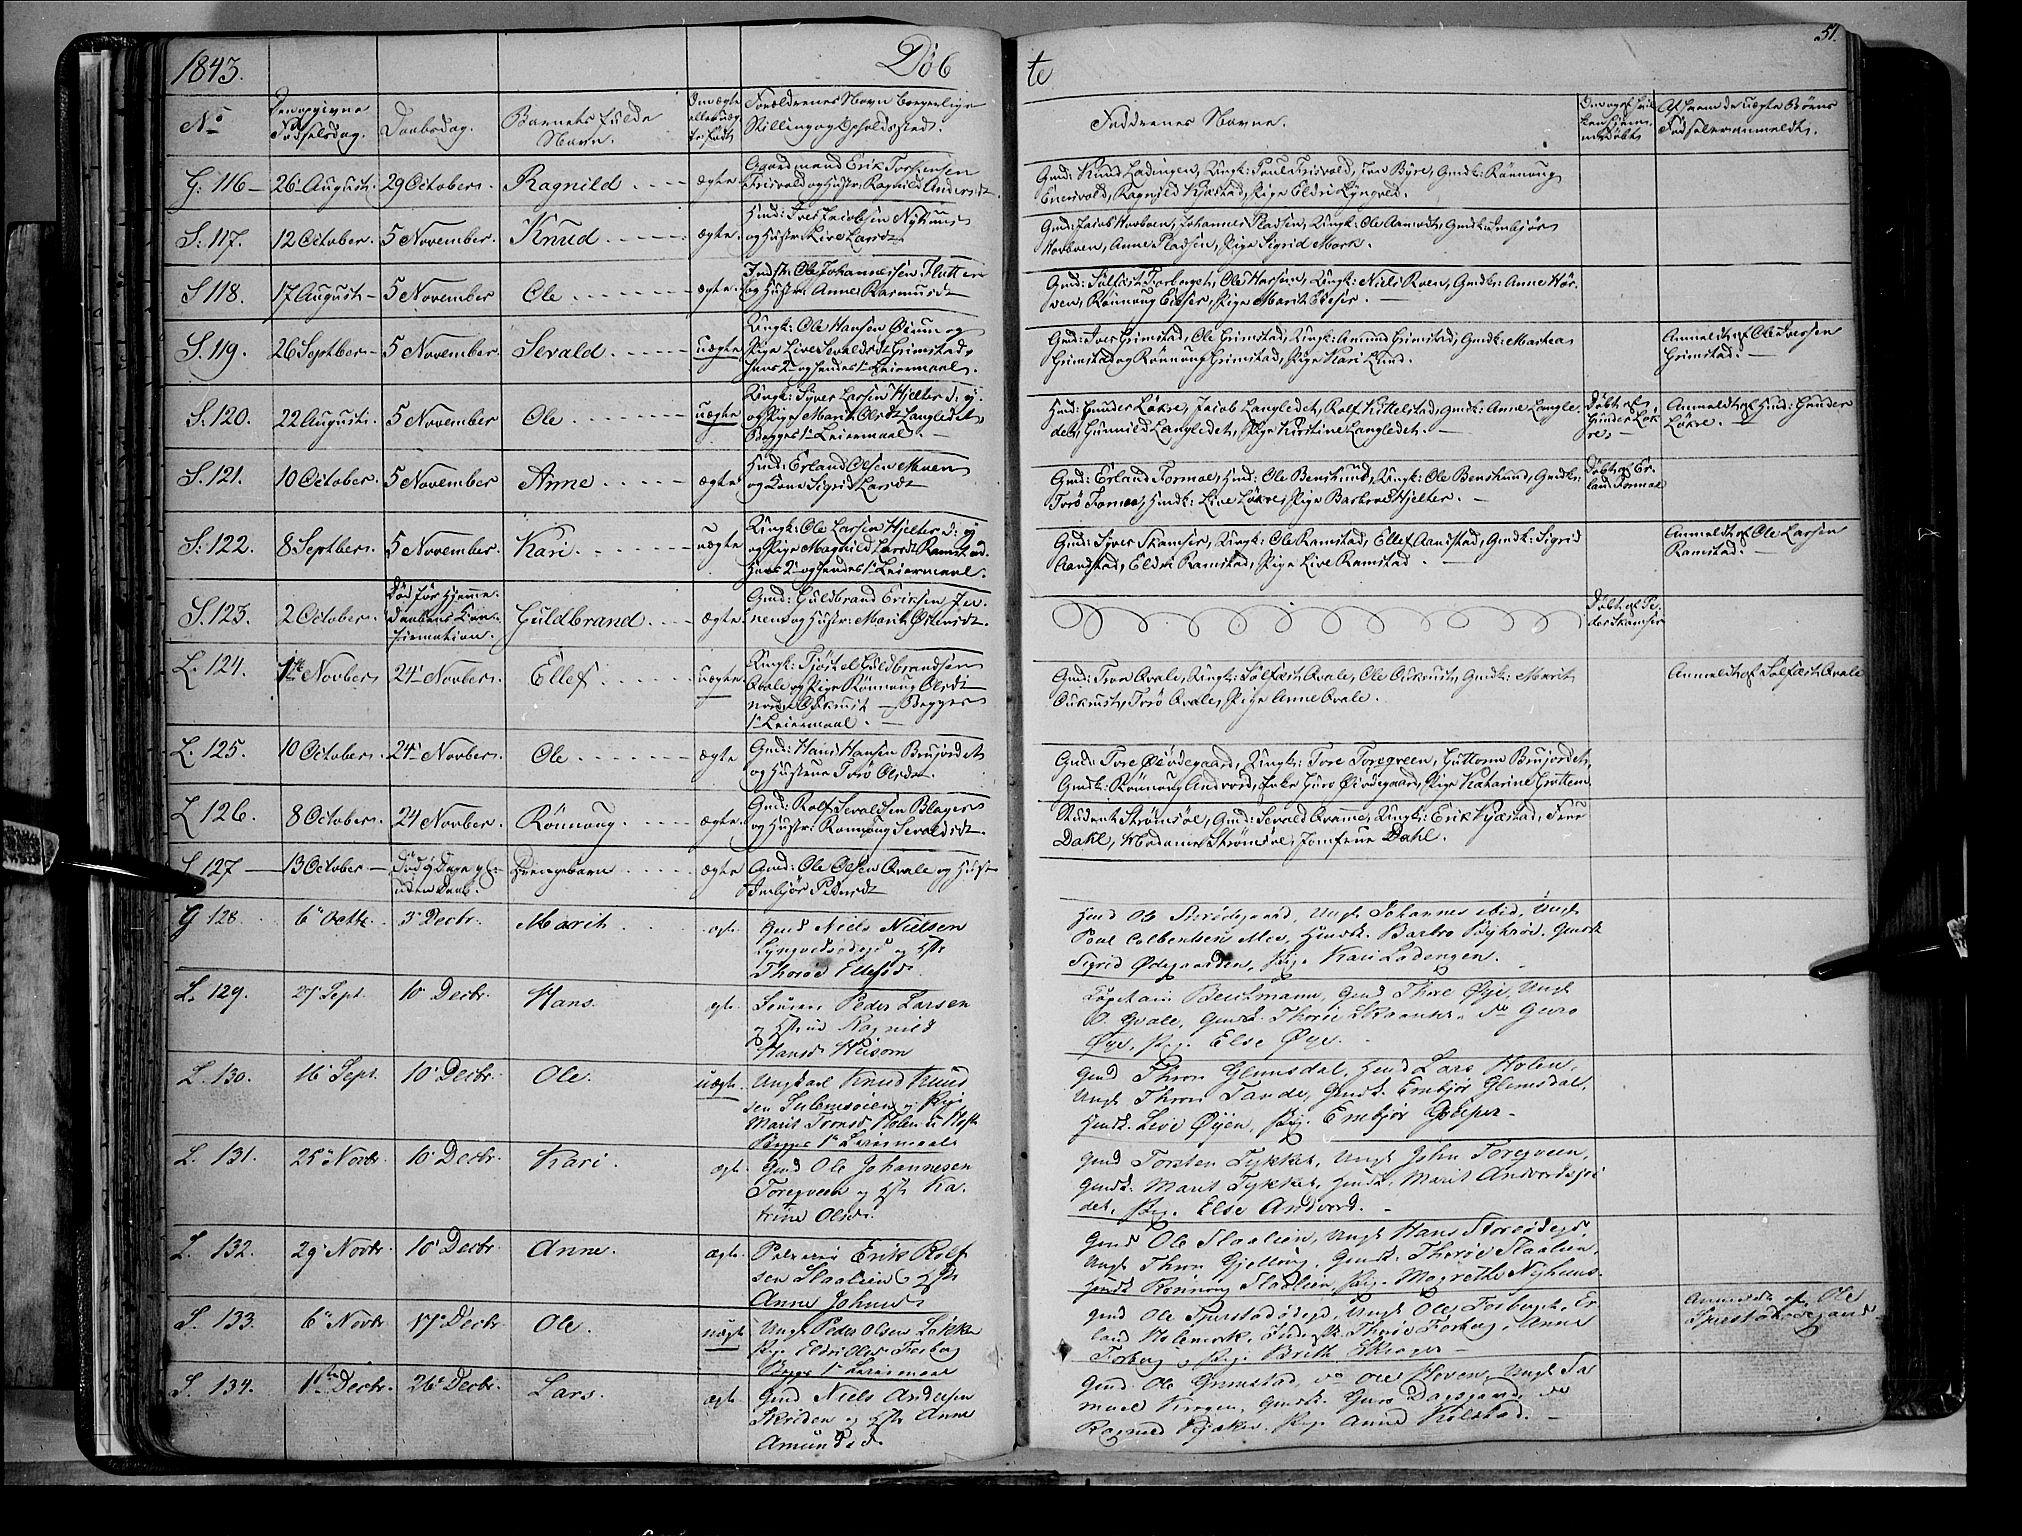 SAH, Lom prestekontor, K/L0006: Parish register (official) no. 6A, 1837-1863, p. 51